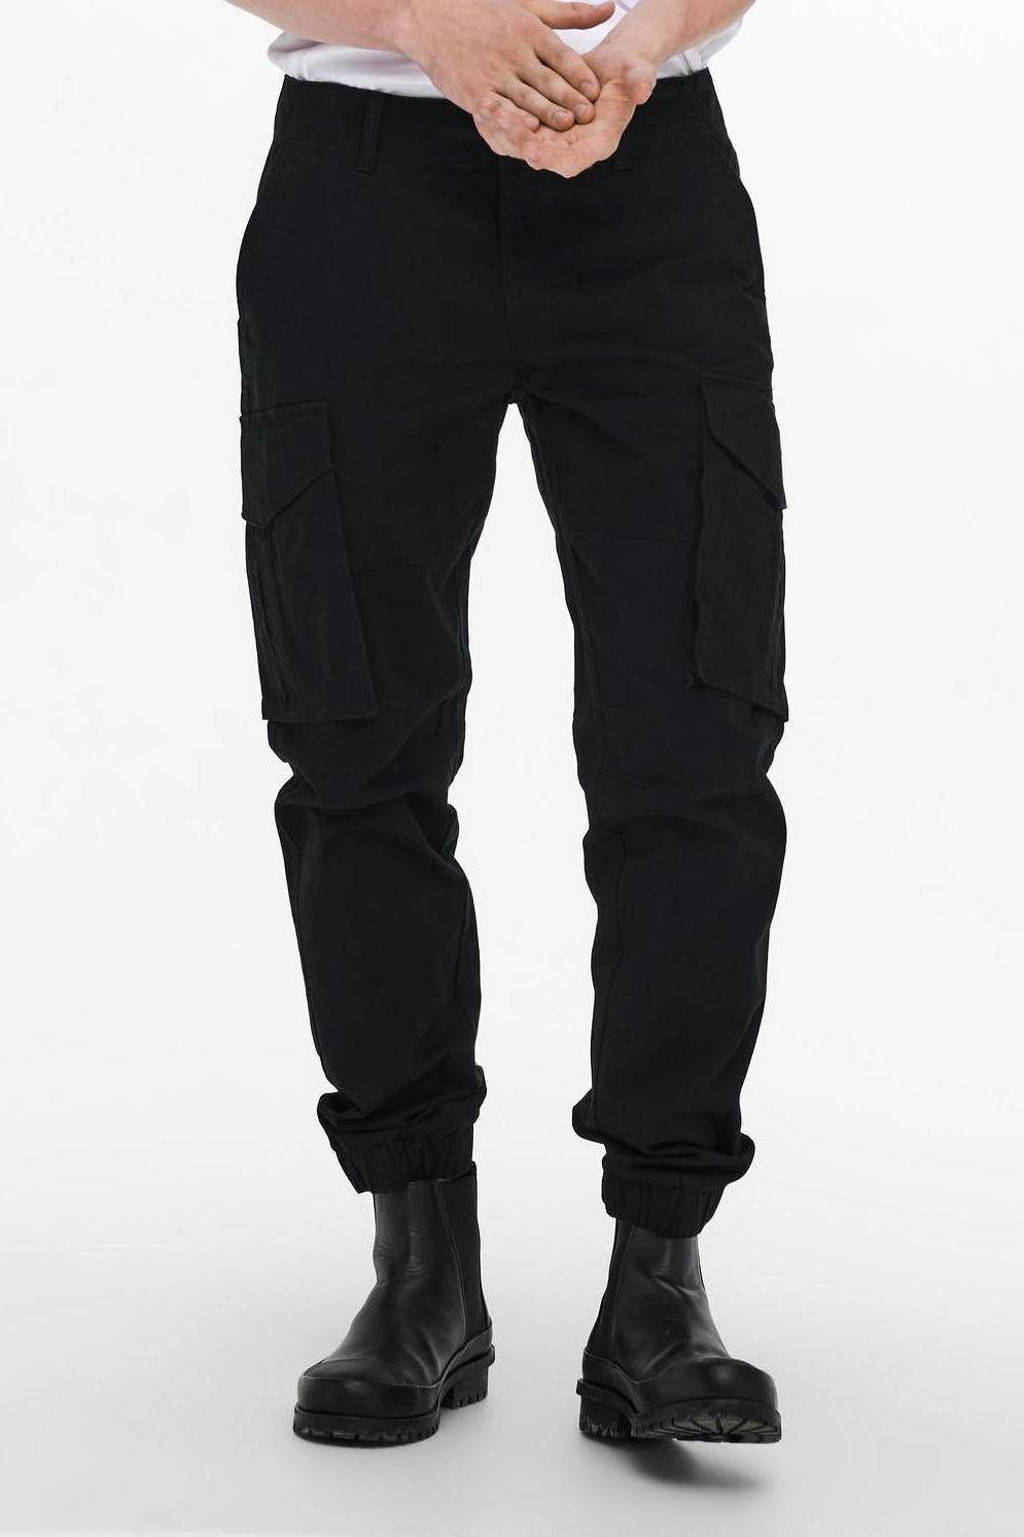 ONLY & SONS tapered fit broek ONSKIM black, Black